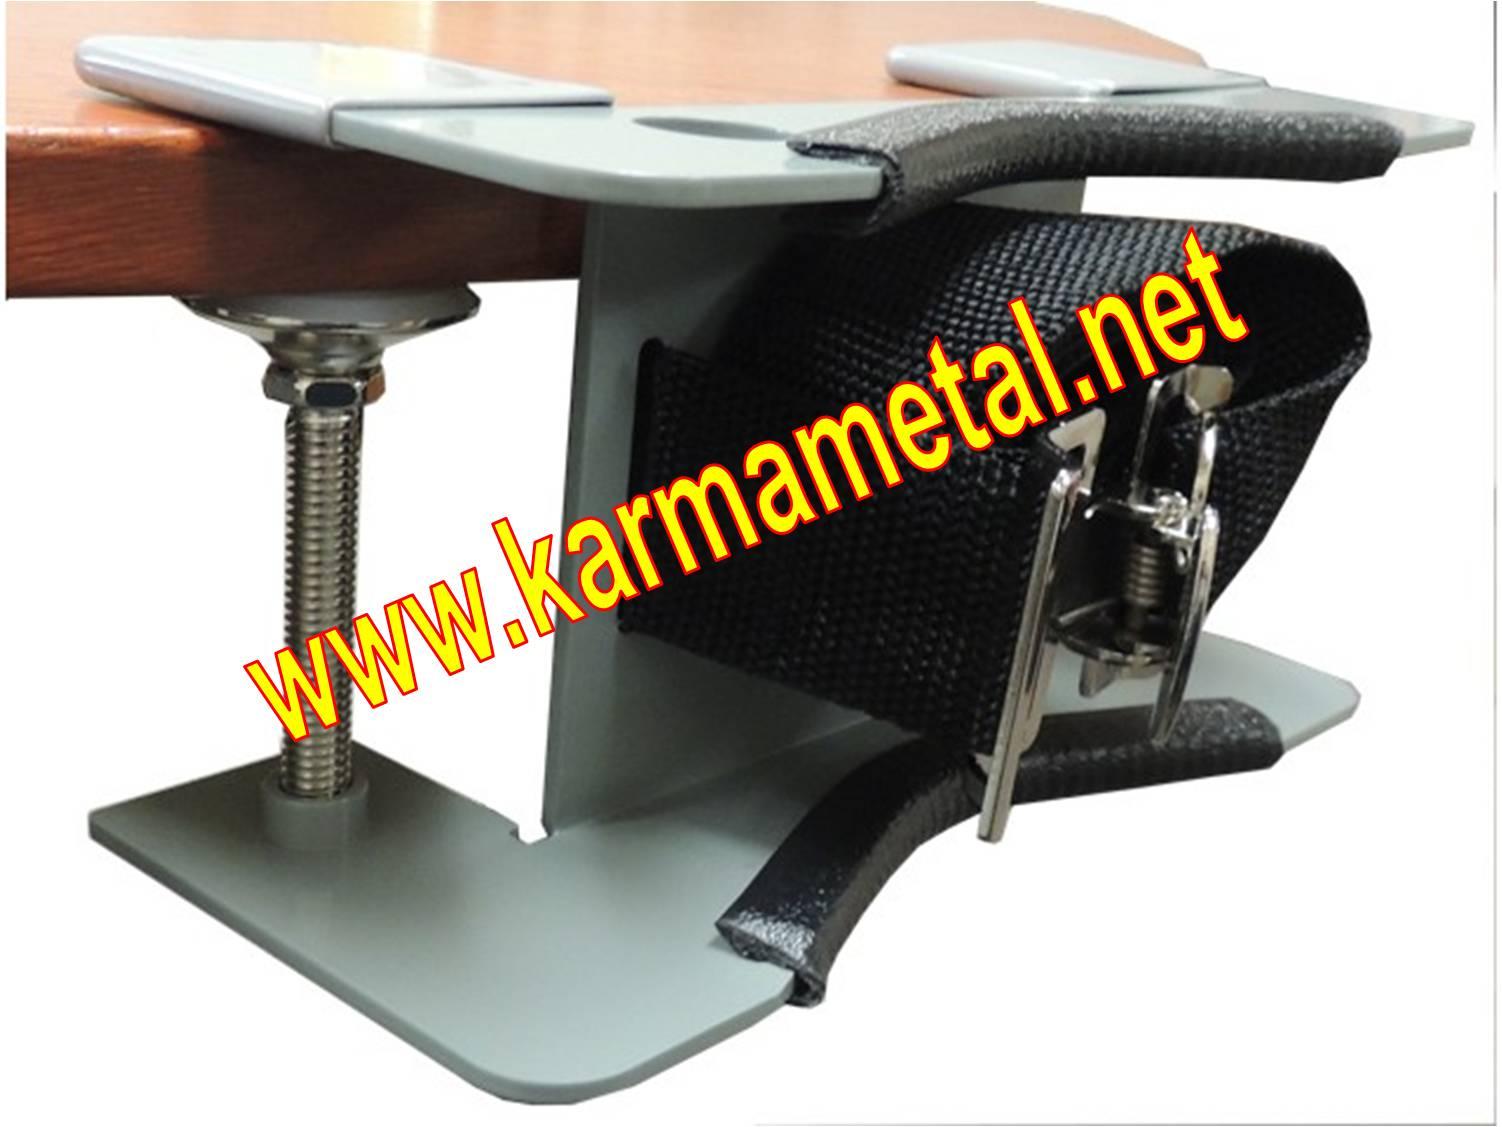 duvar-tipi-sanayi-oksijen-tupu-duvara-tup-sabitleme-koruma-baglama-standi-aparati-braketi-sabitleyici-zinciri